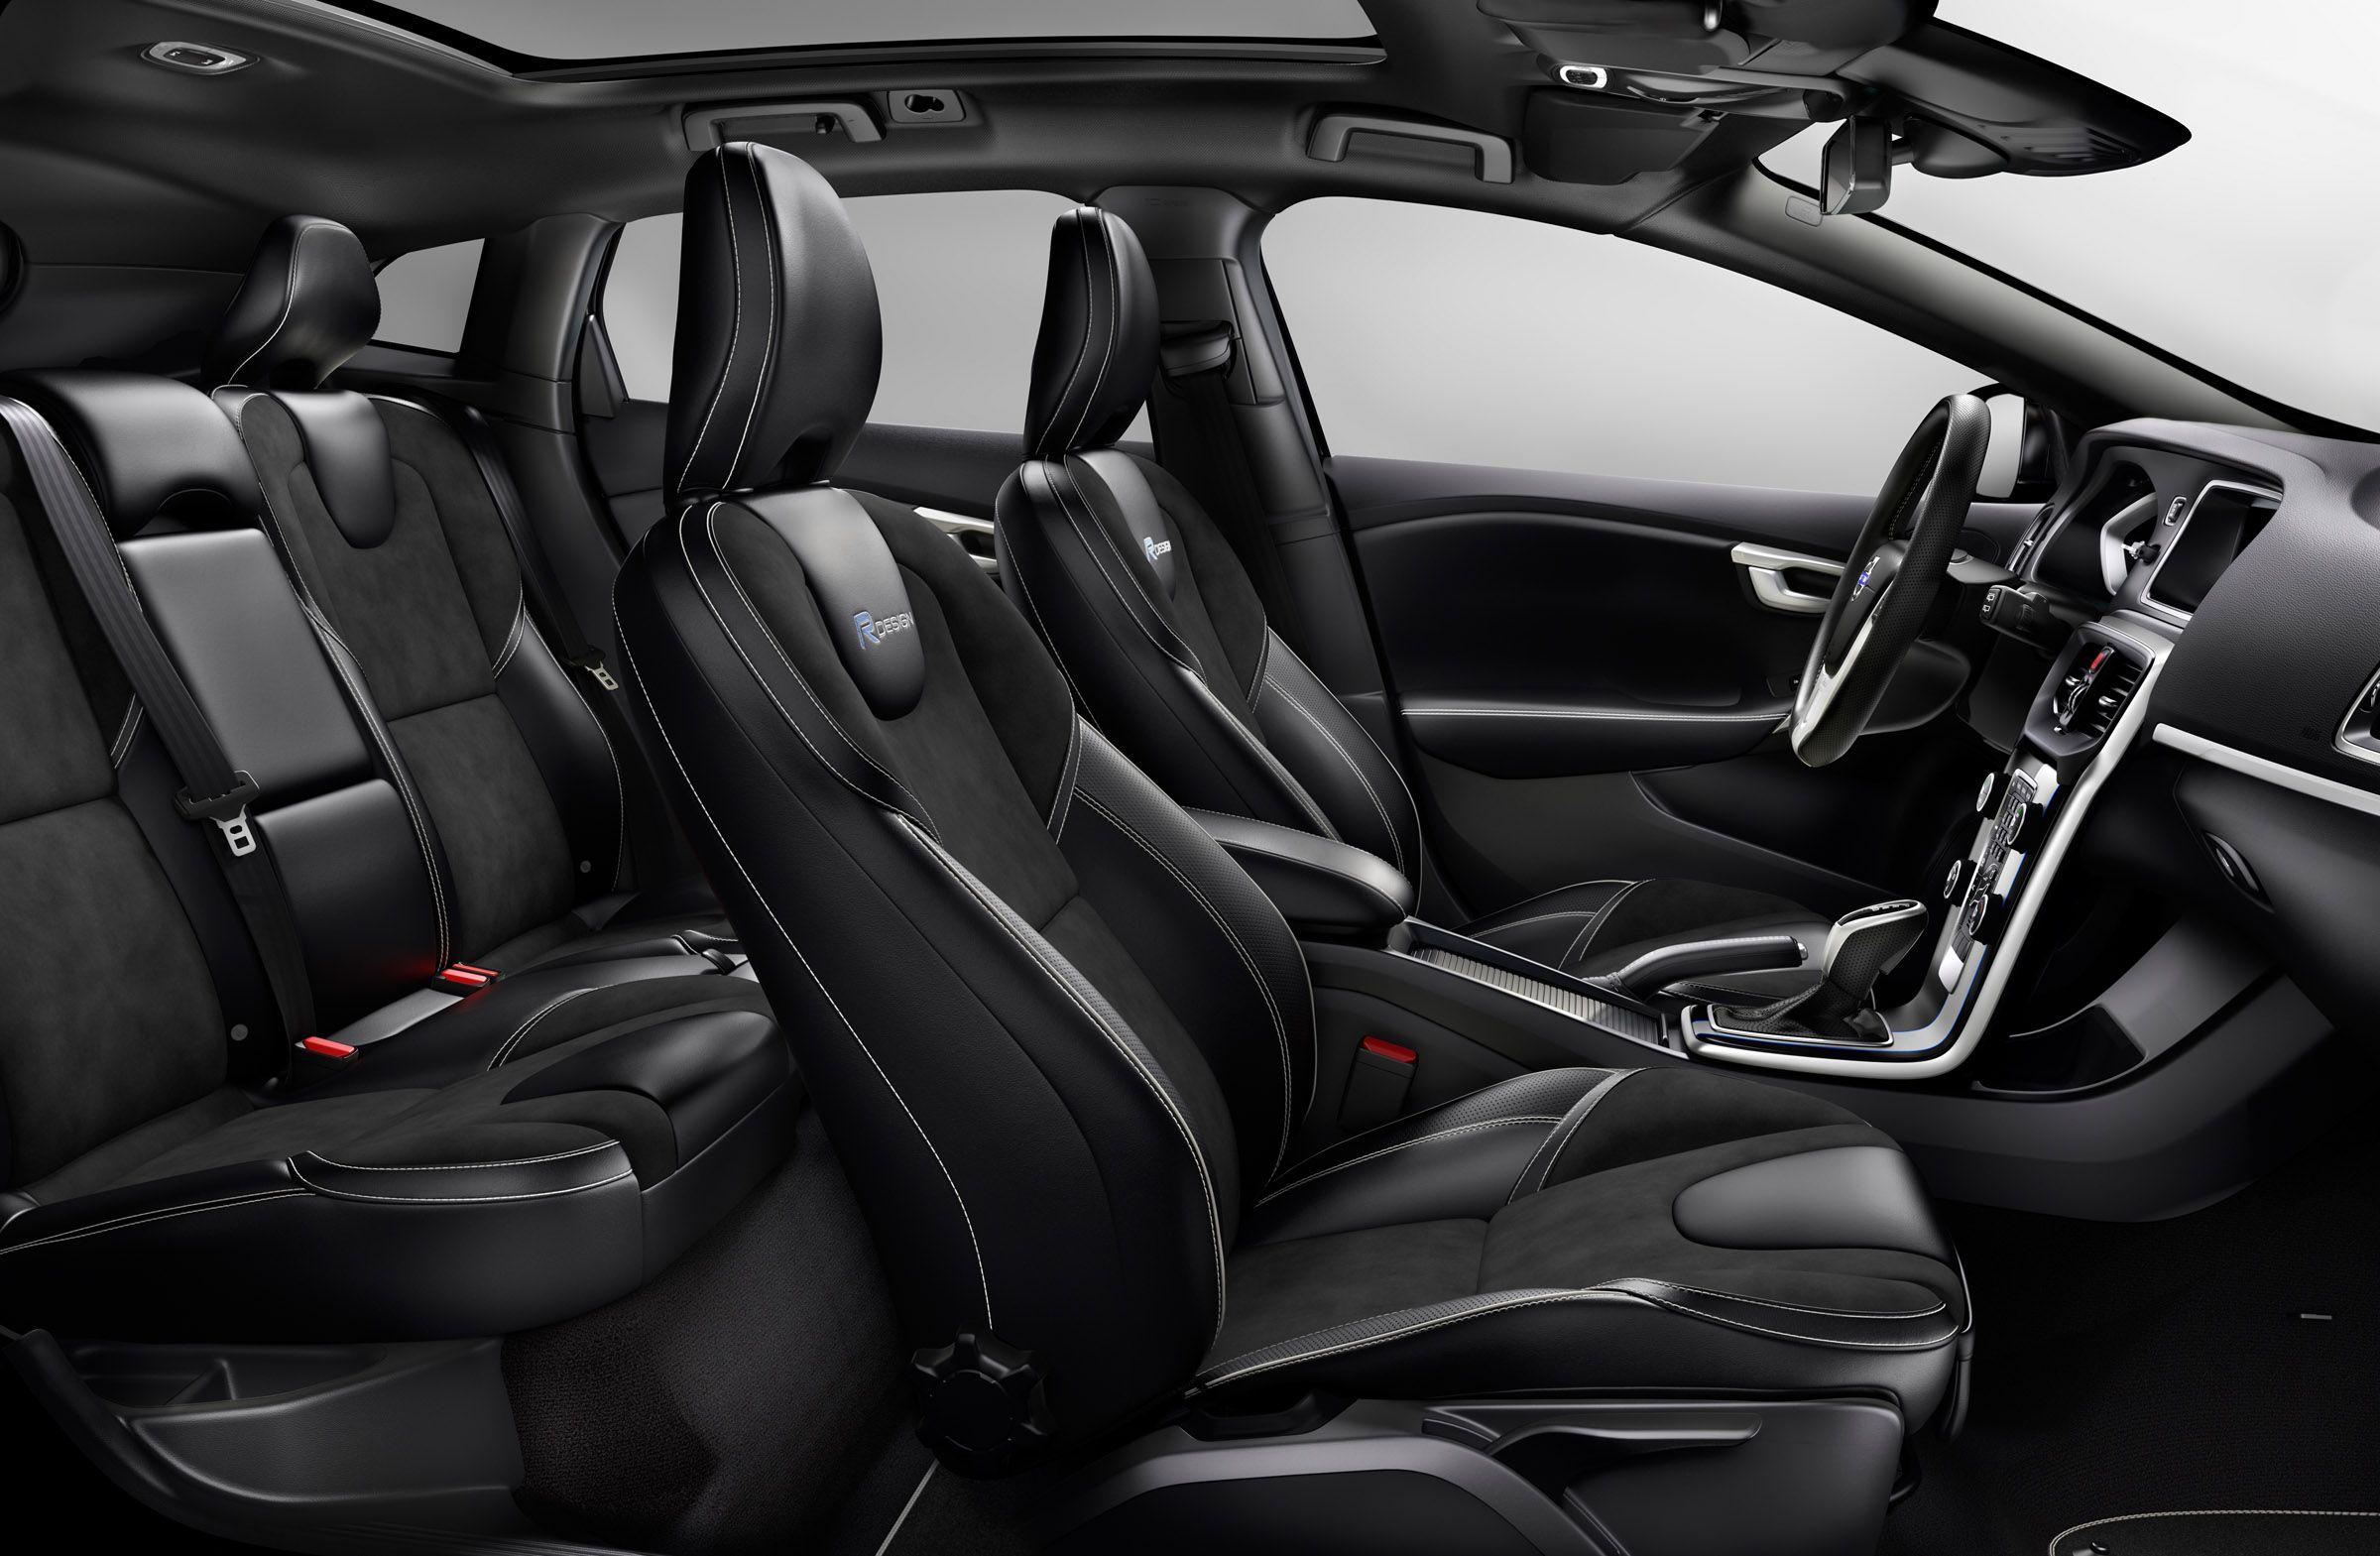 black car interior - Google Search | Cars | Pinterest | Volvo s60 ...